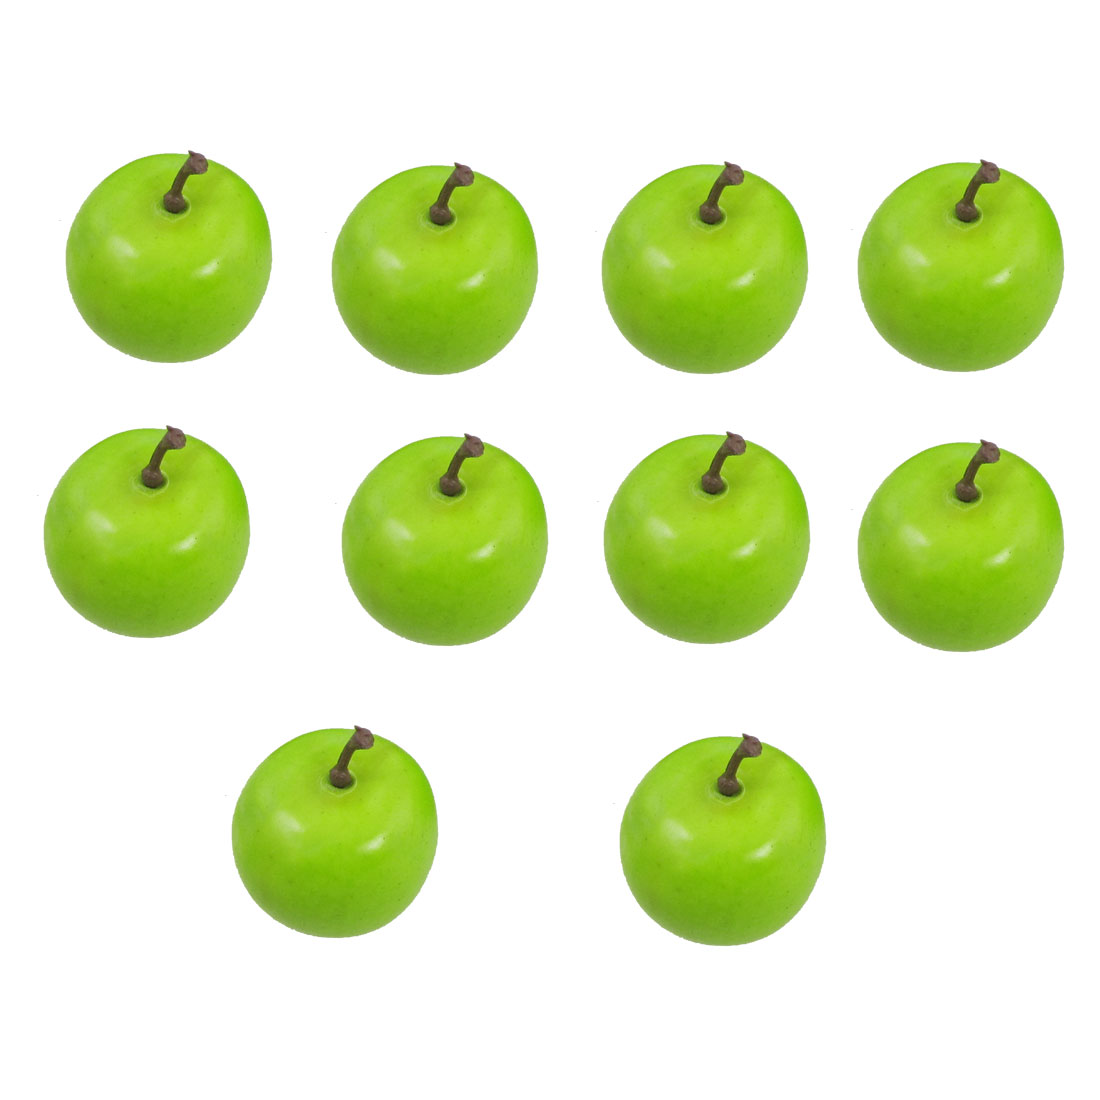 Green Manmade Foam Artifical Apple Simulation Fruits Cabinet Decor 10 Pcs